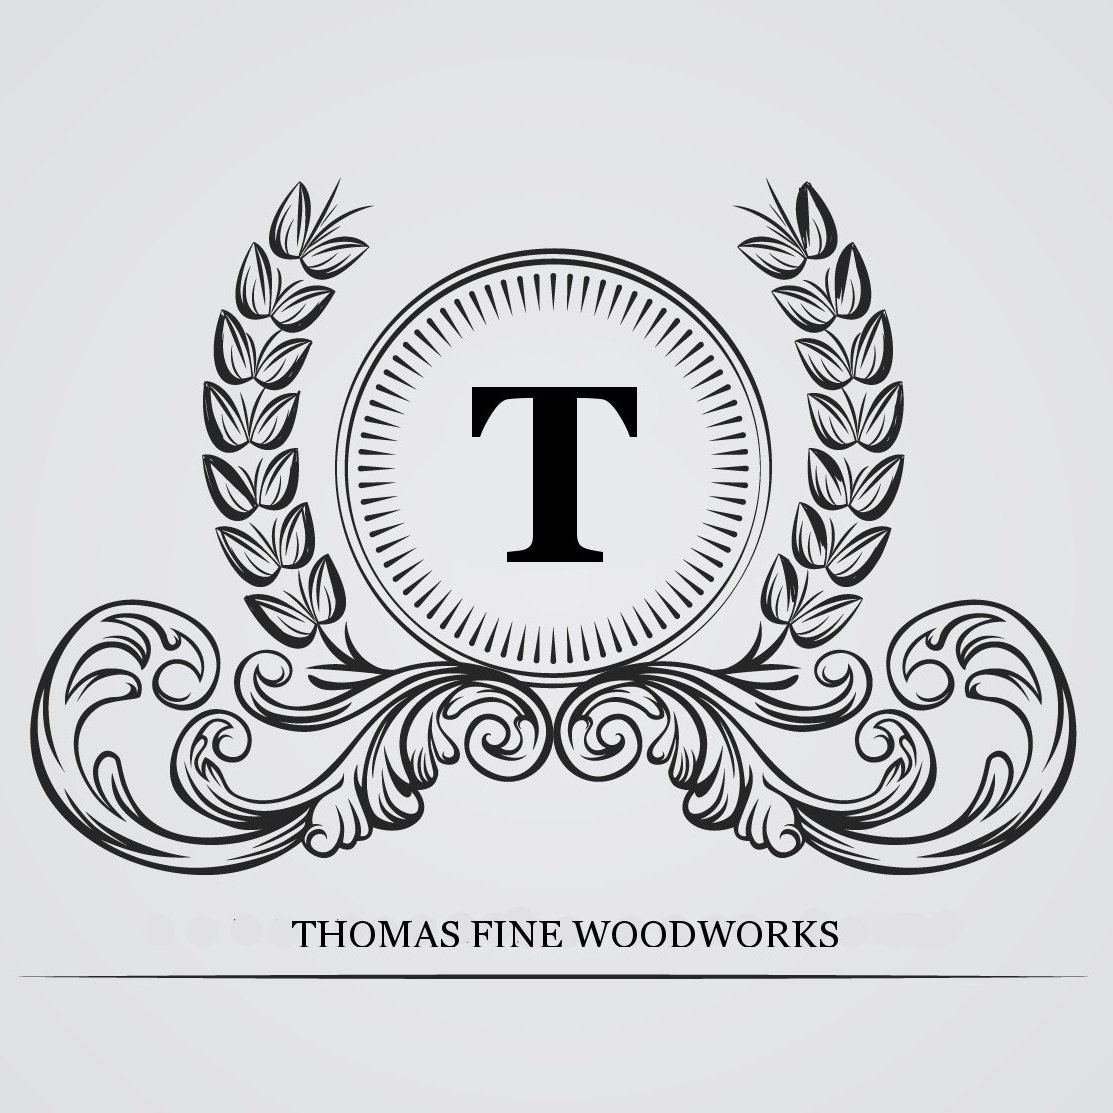 ThomasFineWoodworks